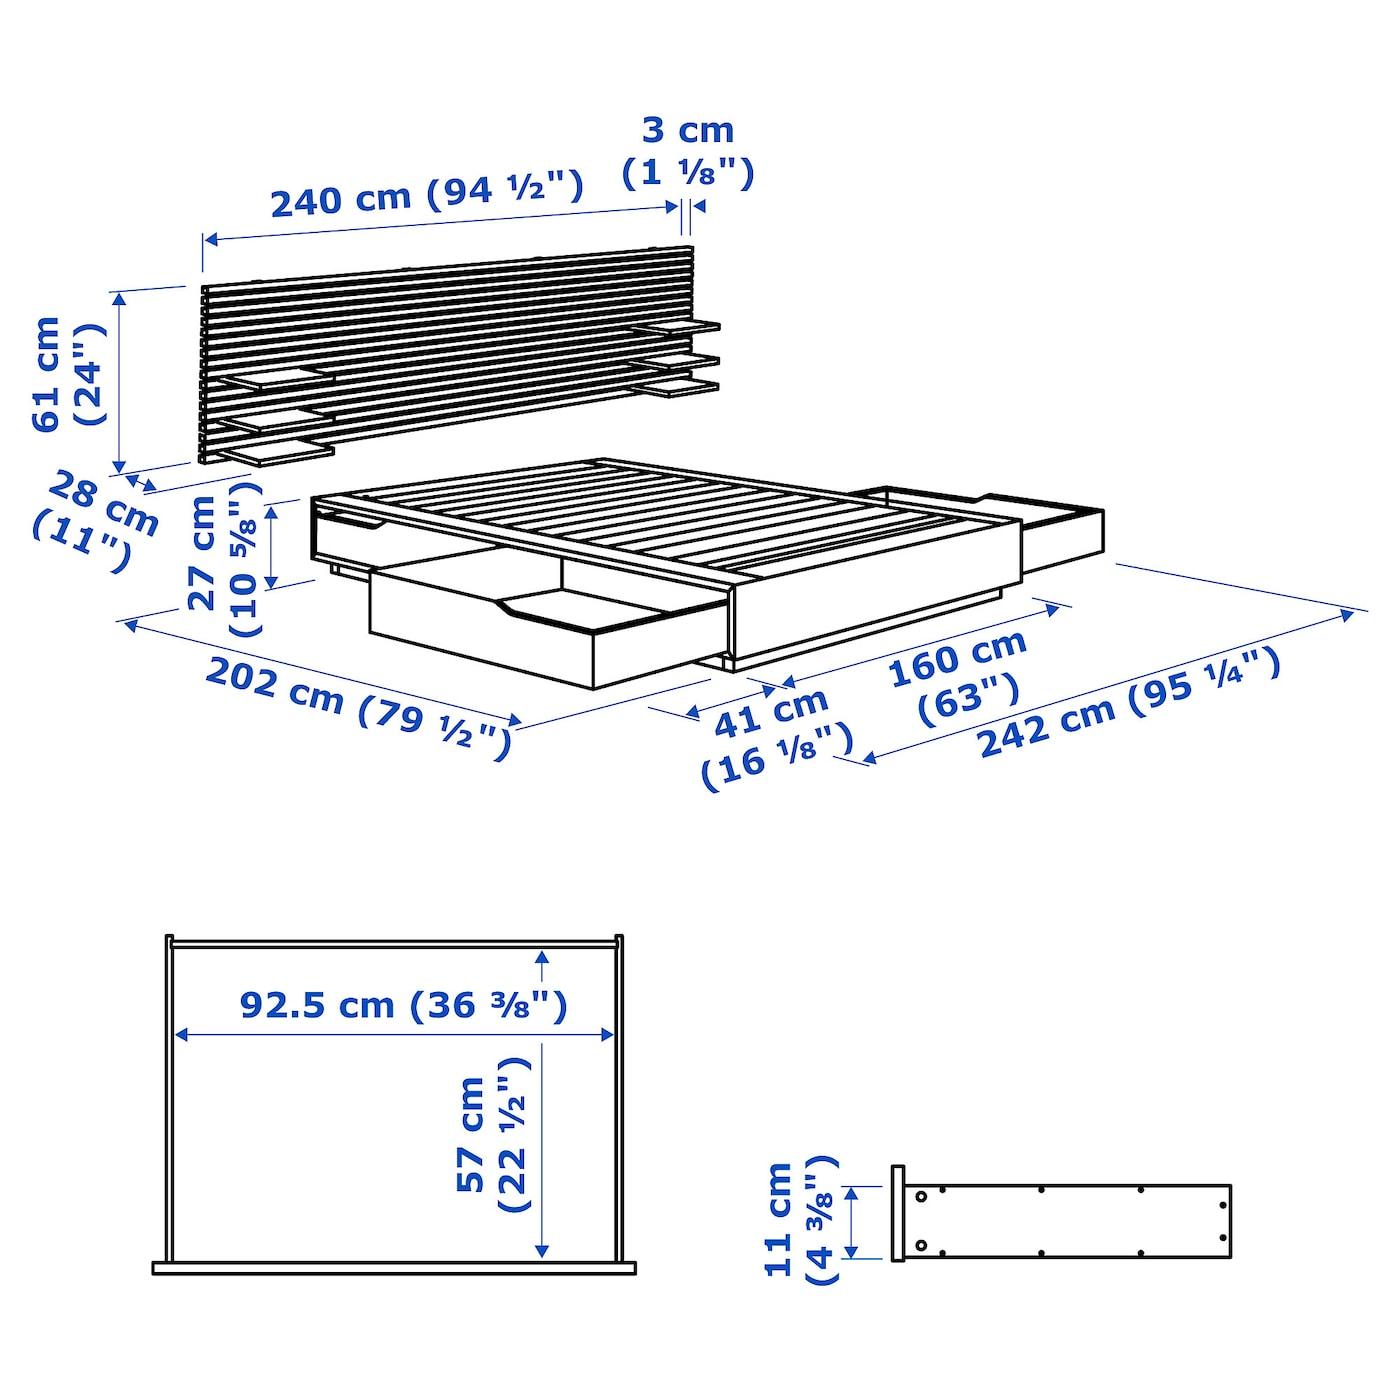 ikea mandal bed instructions